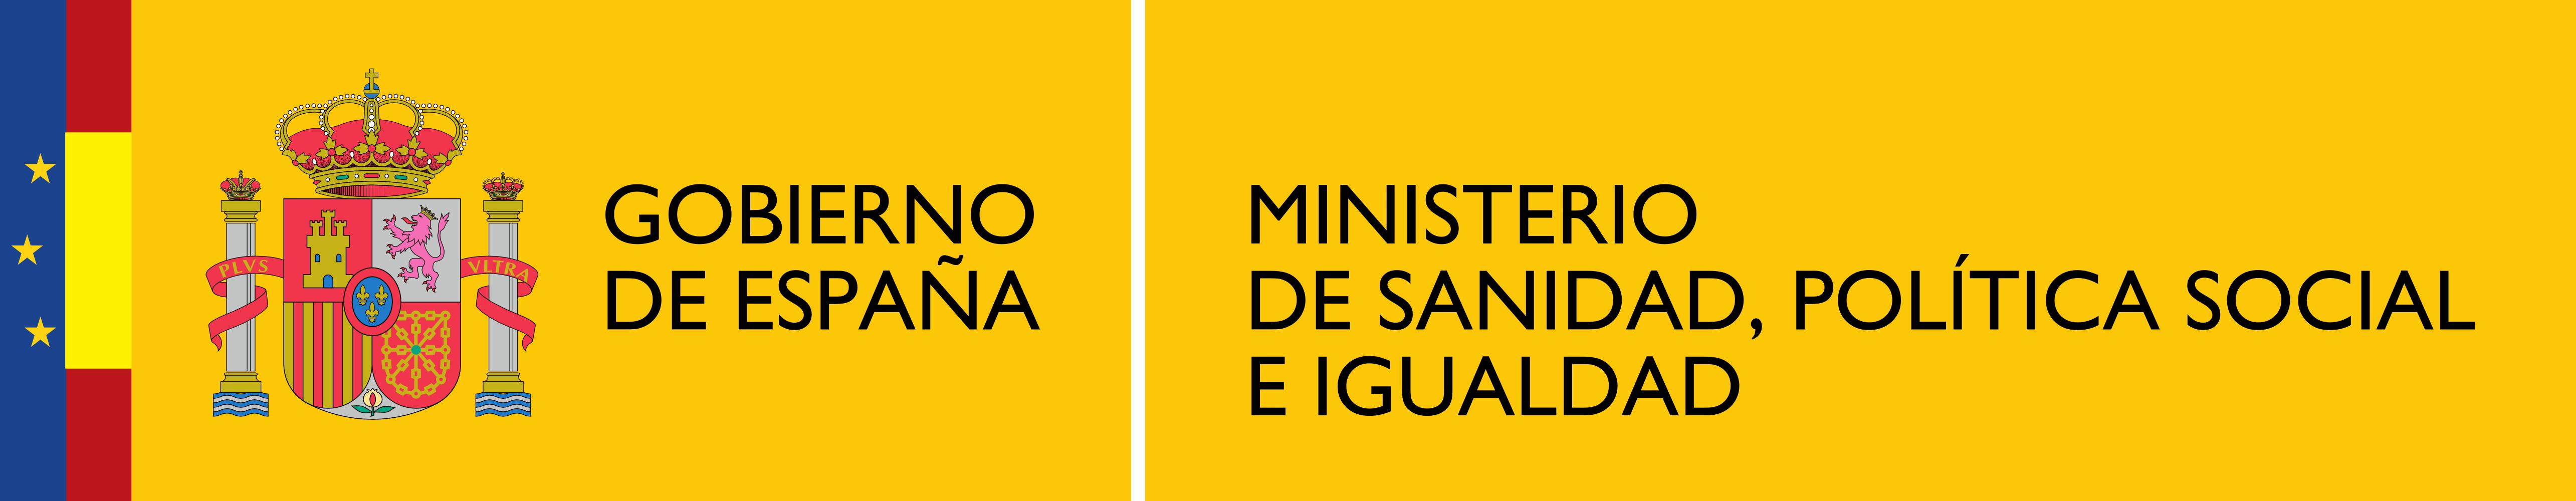 https://upload.wikimedia.org/wikipedia/commons/d/d2/Logotipo_del_Ministerio_de_Sanidad,_Pol%C3%ADtica_Social_e_Igualdad.png